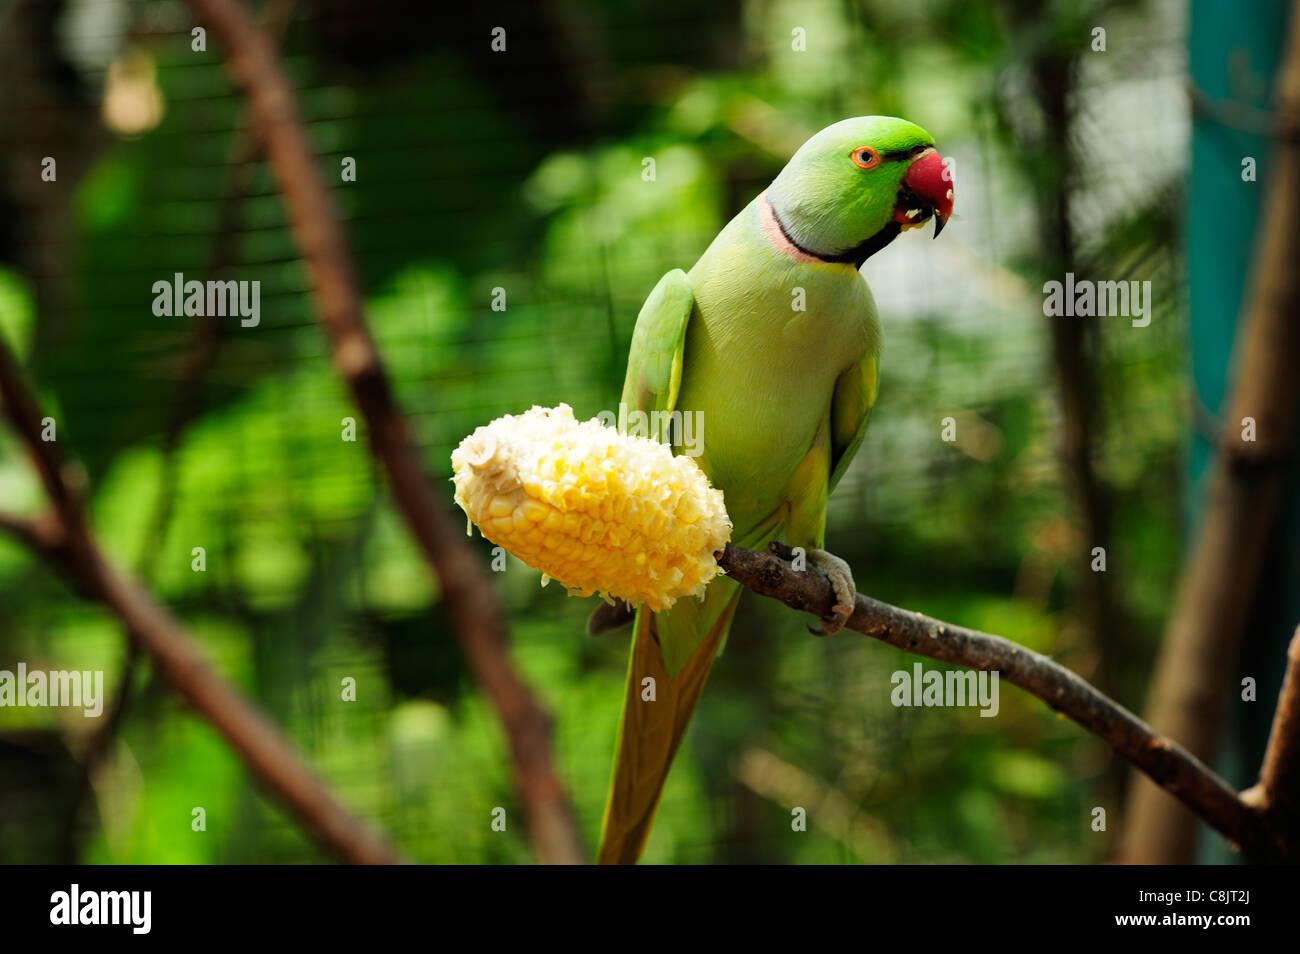 Green parrot at the Bird Park within the Lake Gardens (Taman Tasik Perdana), Kuala Lumpur, Malaysia - Stock Image